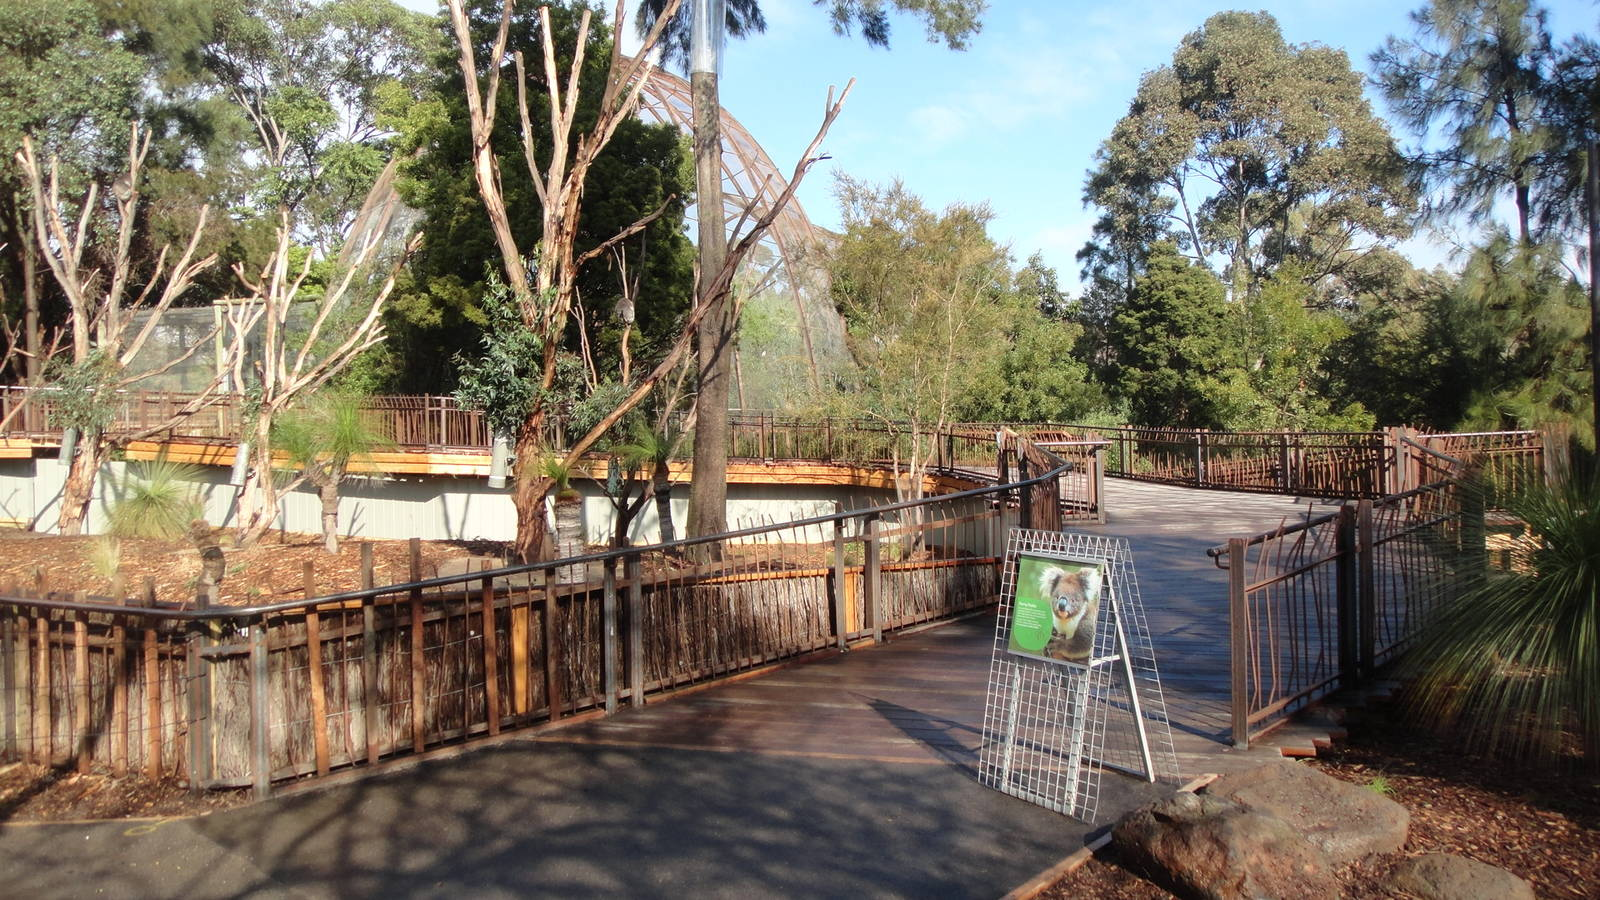 Koalas In Australia Koala Information And Photos - MVlC